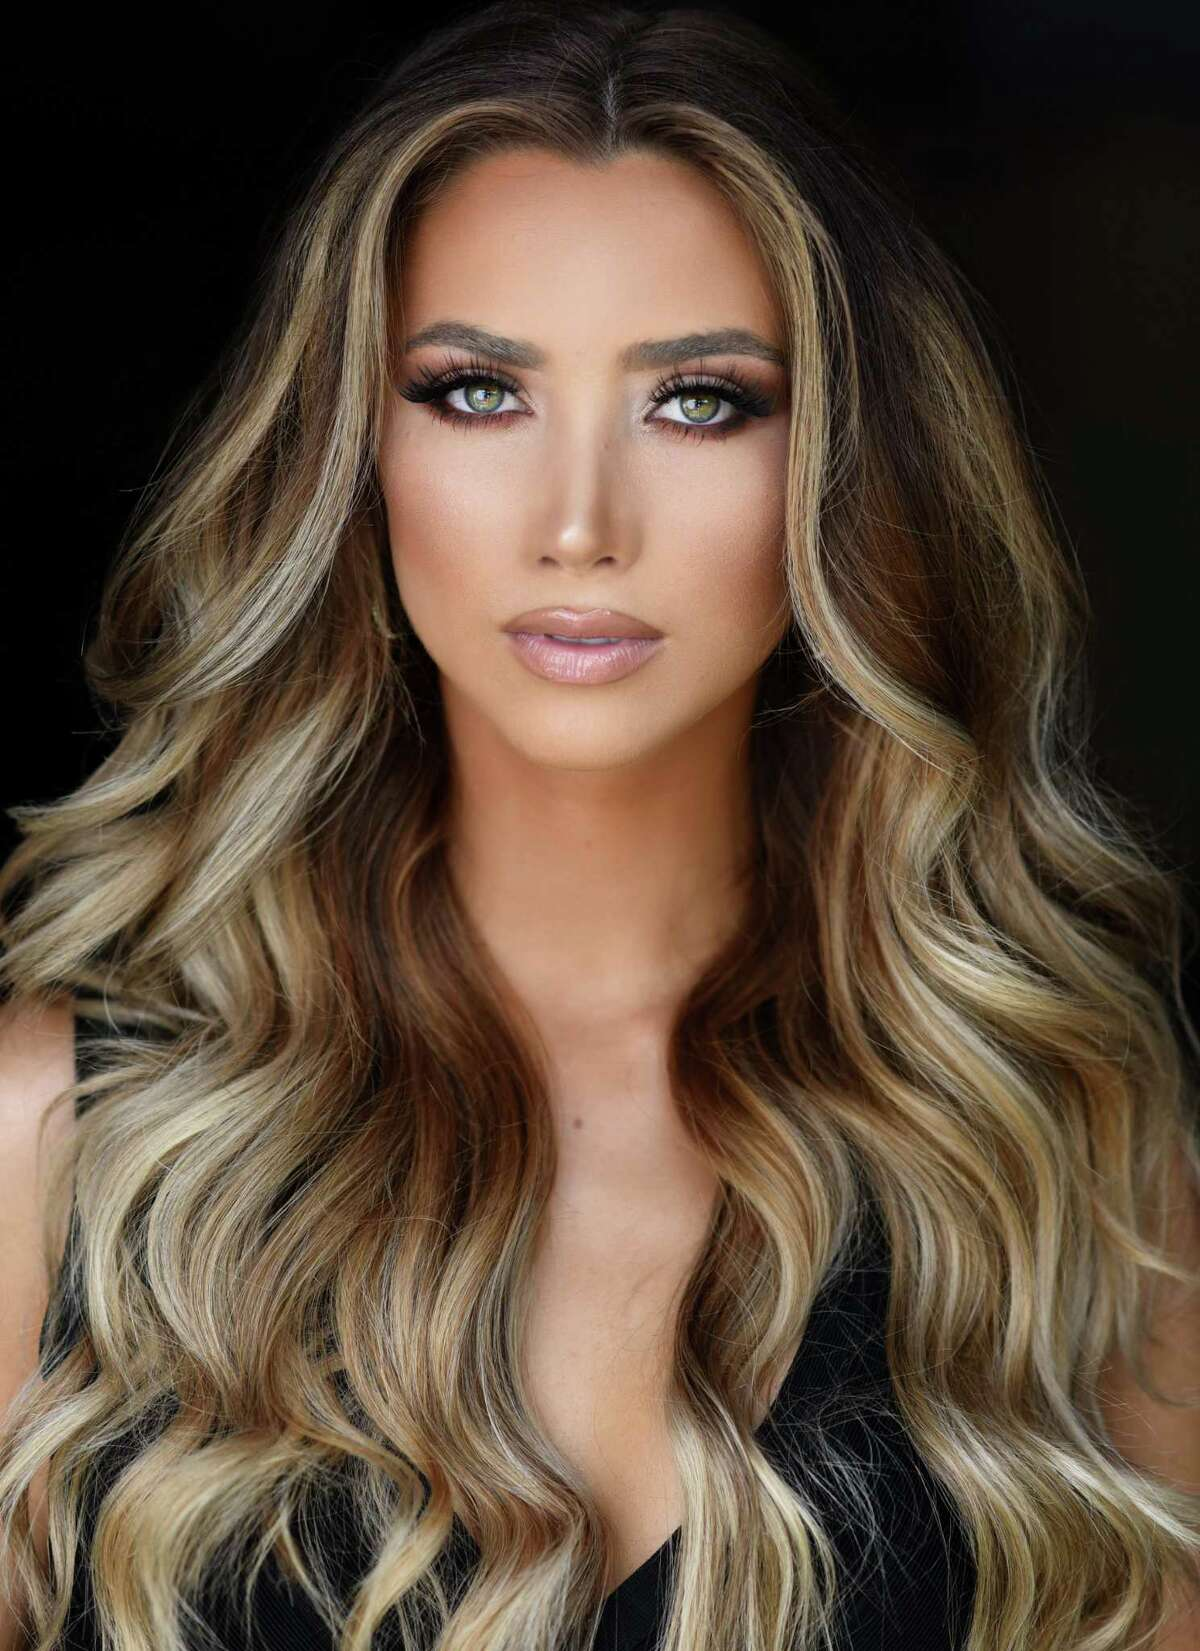 Miss Central Laredo USA Chelsea Morgensen